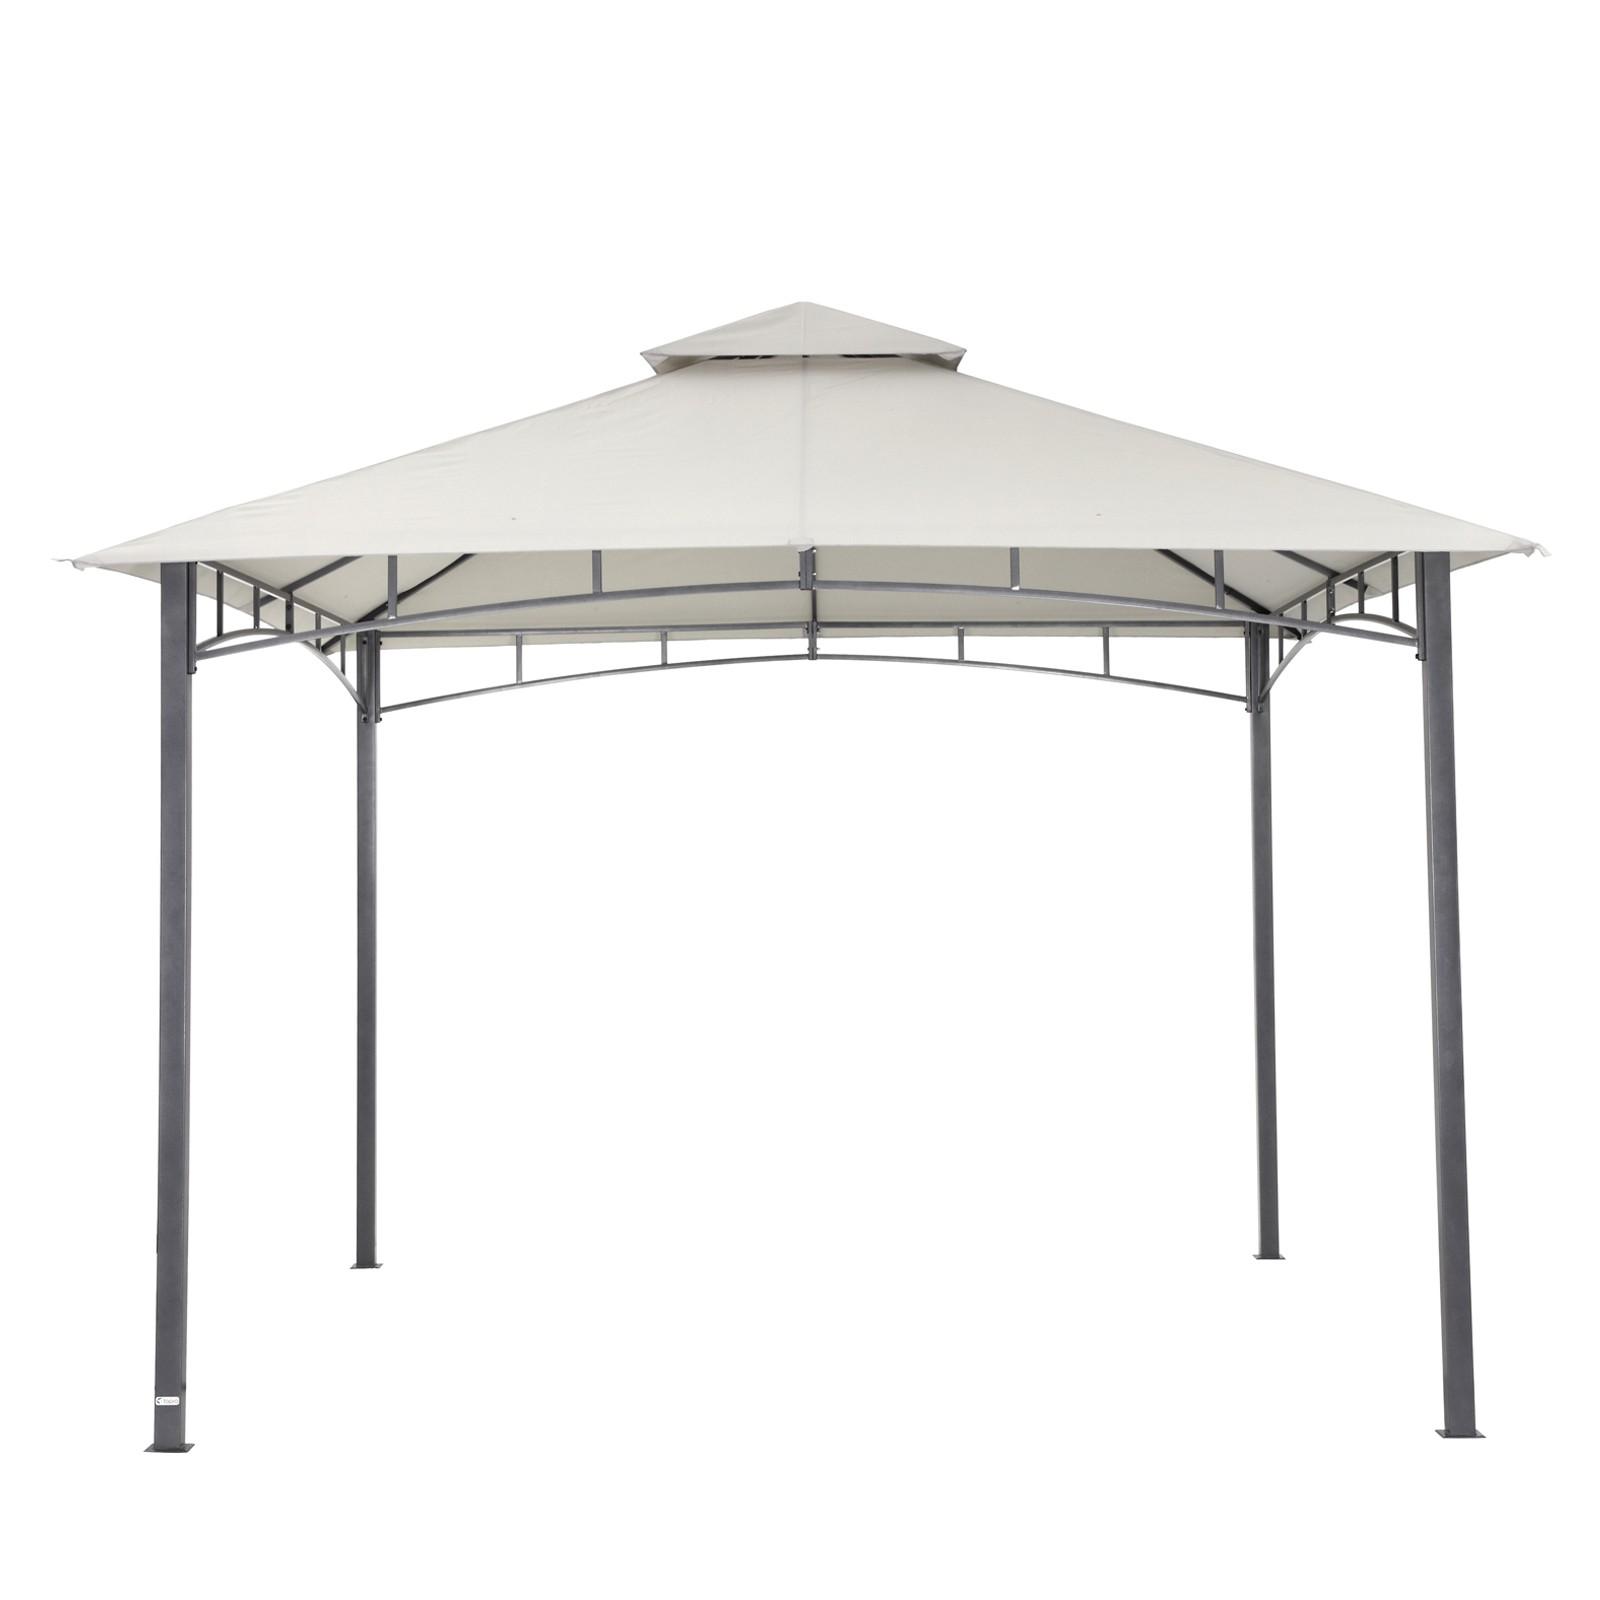 tepro garten pavillon 3x3 m gartenzelt waya grau. Black Bedroom Furniture Sets. Home Design Ideas